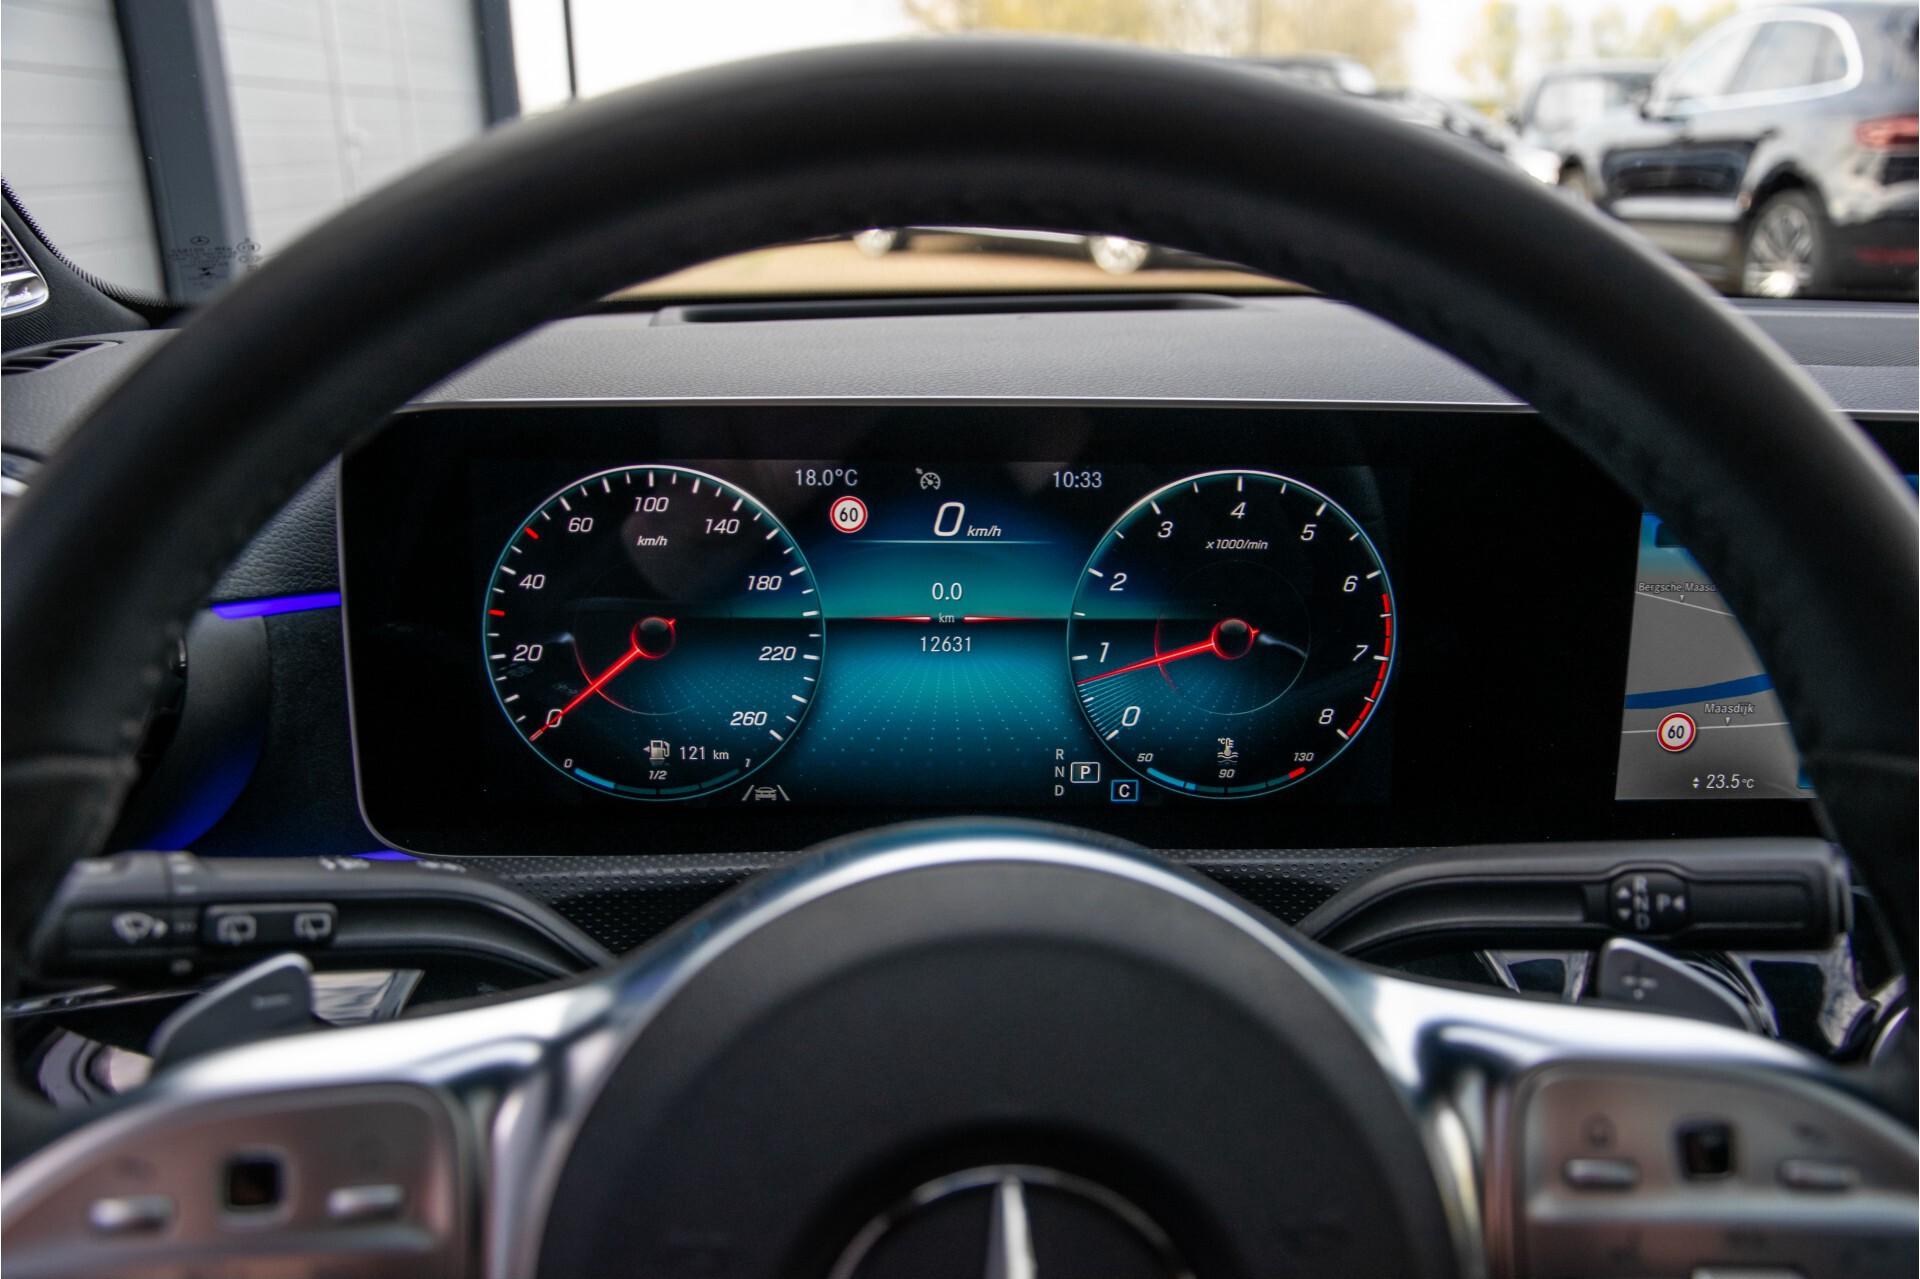 Mercedes-Benz A-Klasse 250 4-M AMG Panorama/Keyless-Entry/MBUX/HUD/Burmester/360/Multibeam LED Aut7 Foto 13